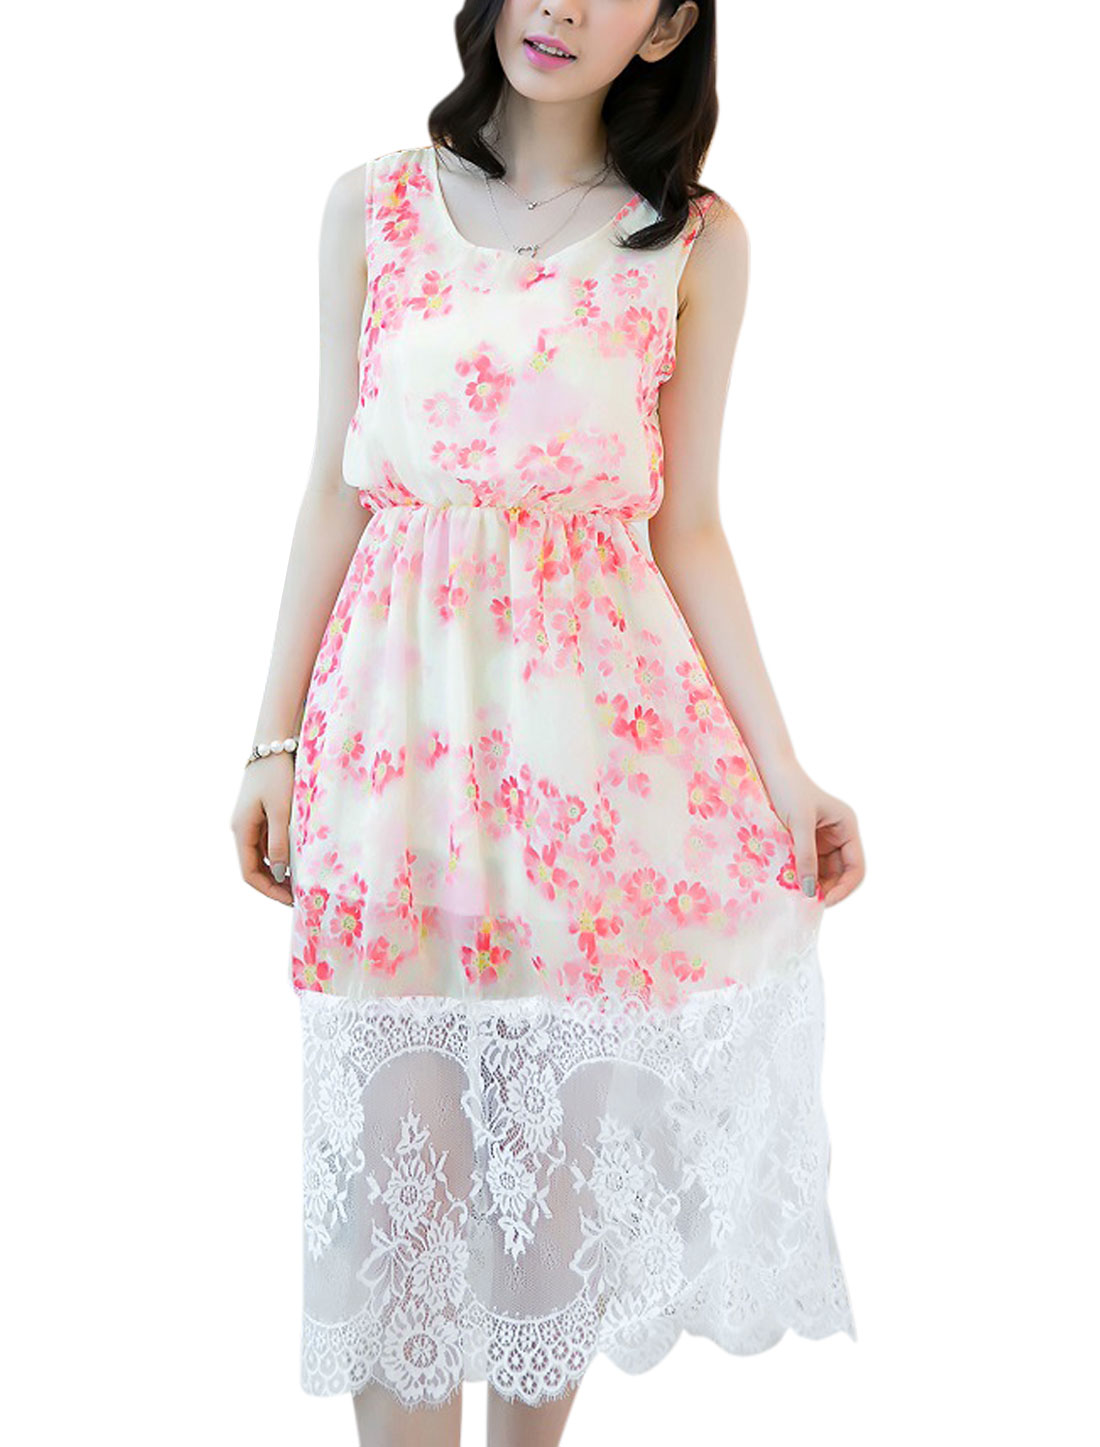 Lady Eyelashes Lace Trim Stretch Waist Sweet Chiffon Tank Dress Pink Beige S